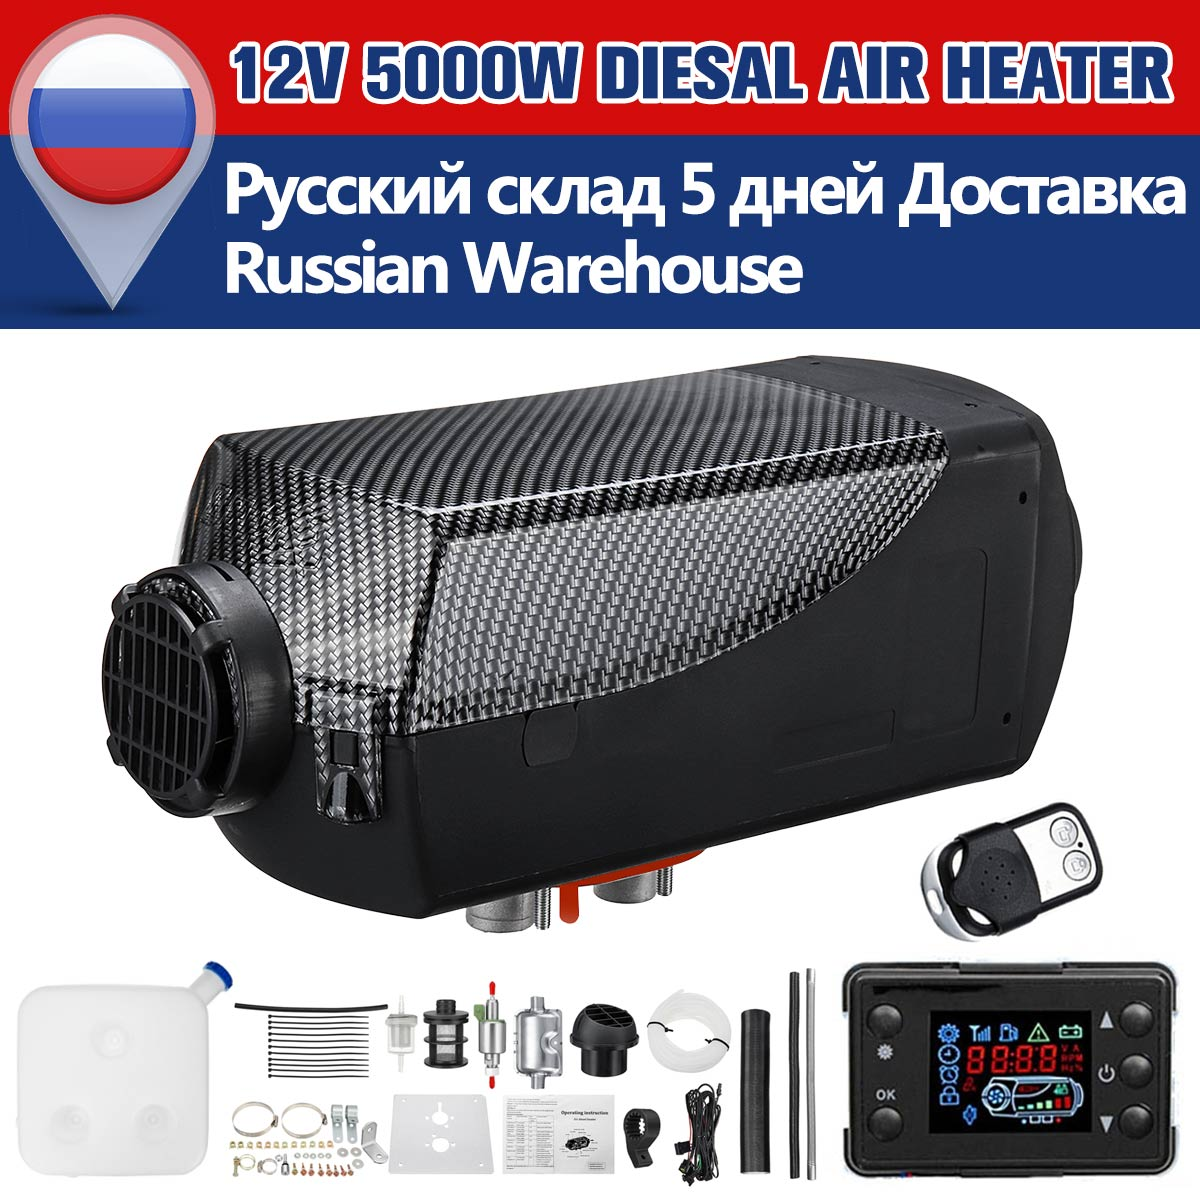 12V 5000W LCD Monitor Air Diesel Heater PLANAR 5KW  for Car Trucks Motor-Homes